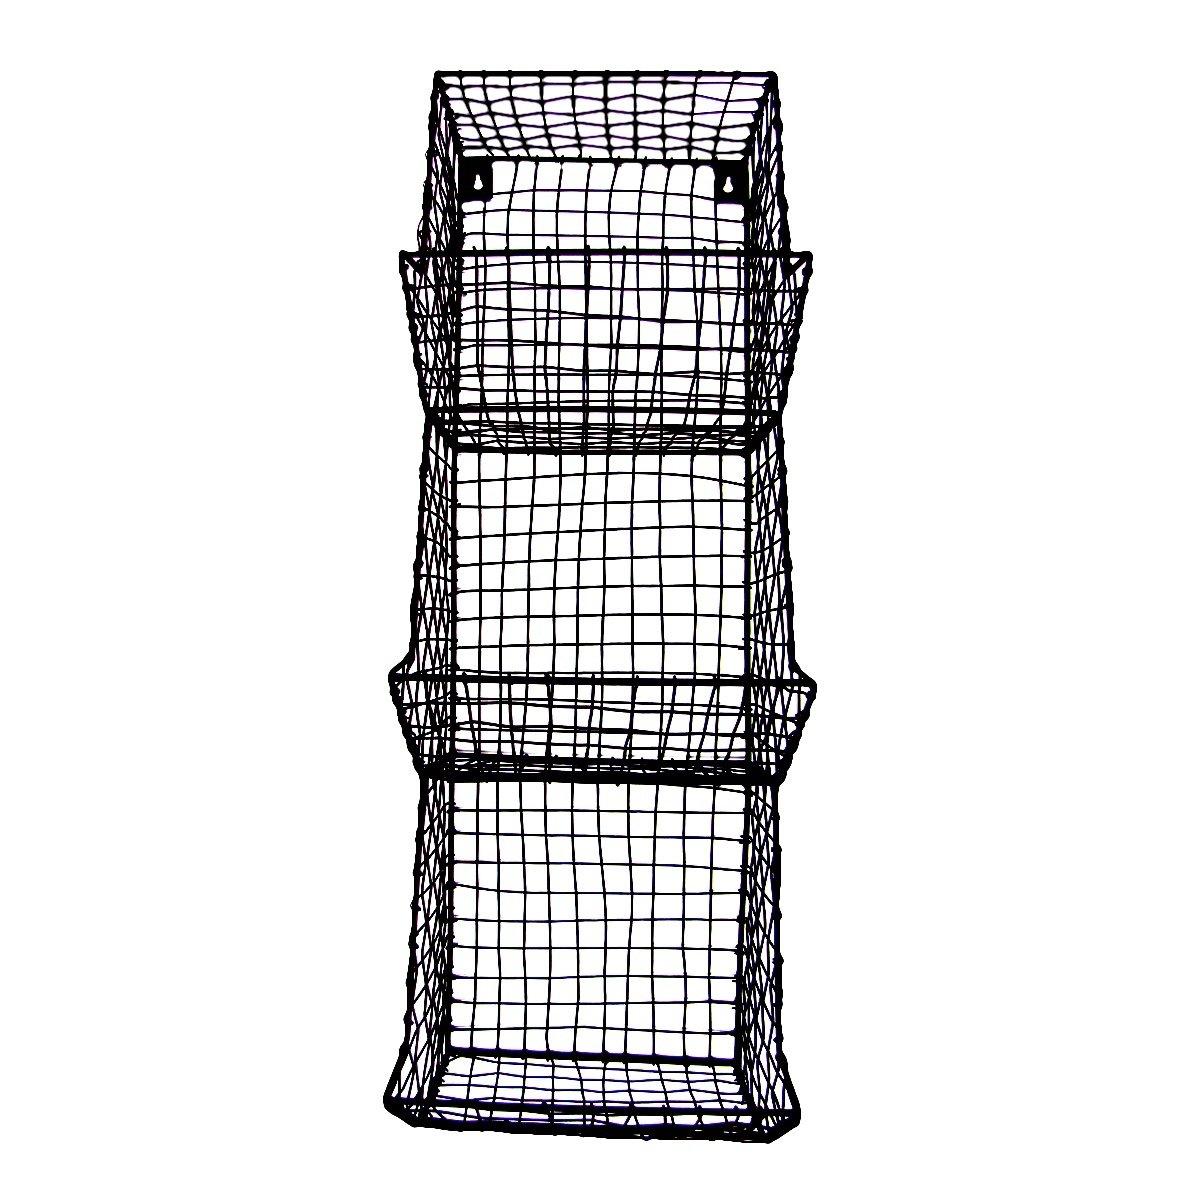 Amazon.com: Wire Wall 3 Storage Bin Fruit/Vegetable Basket Primitive ...